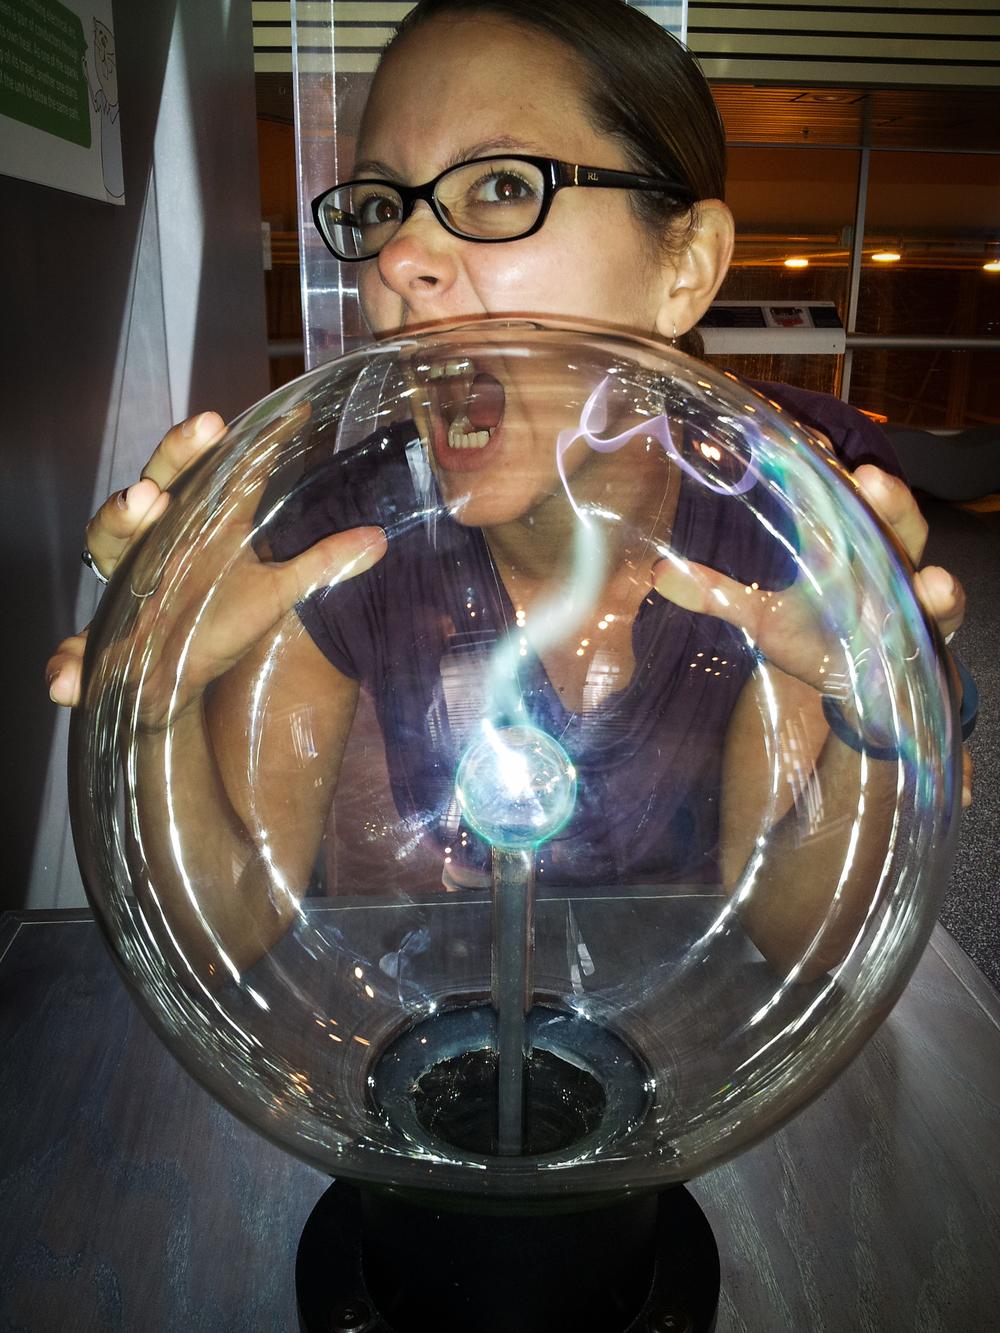 beautiful-woman-playing-with-a-plasma-ball.jpg